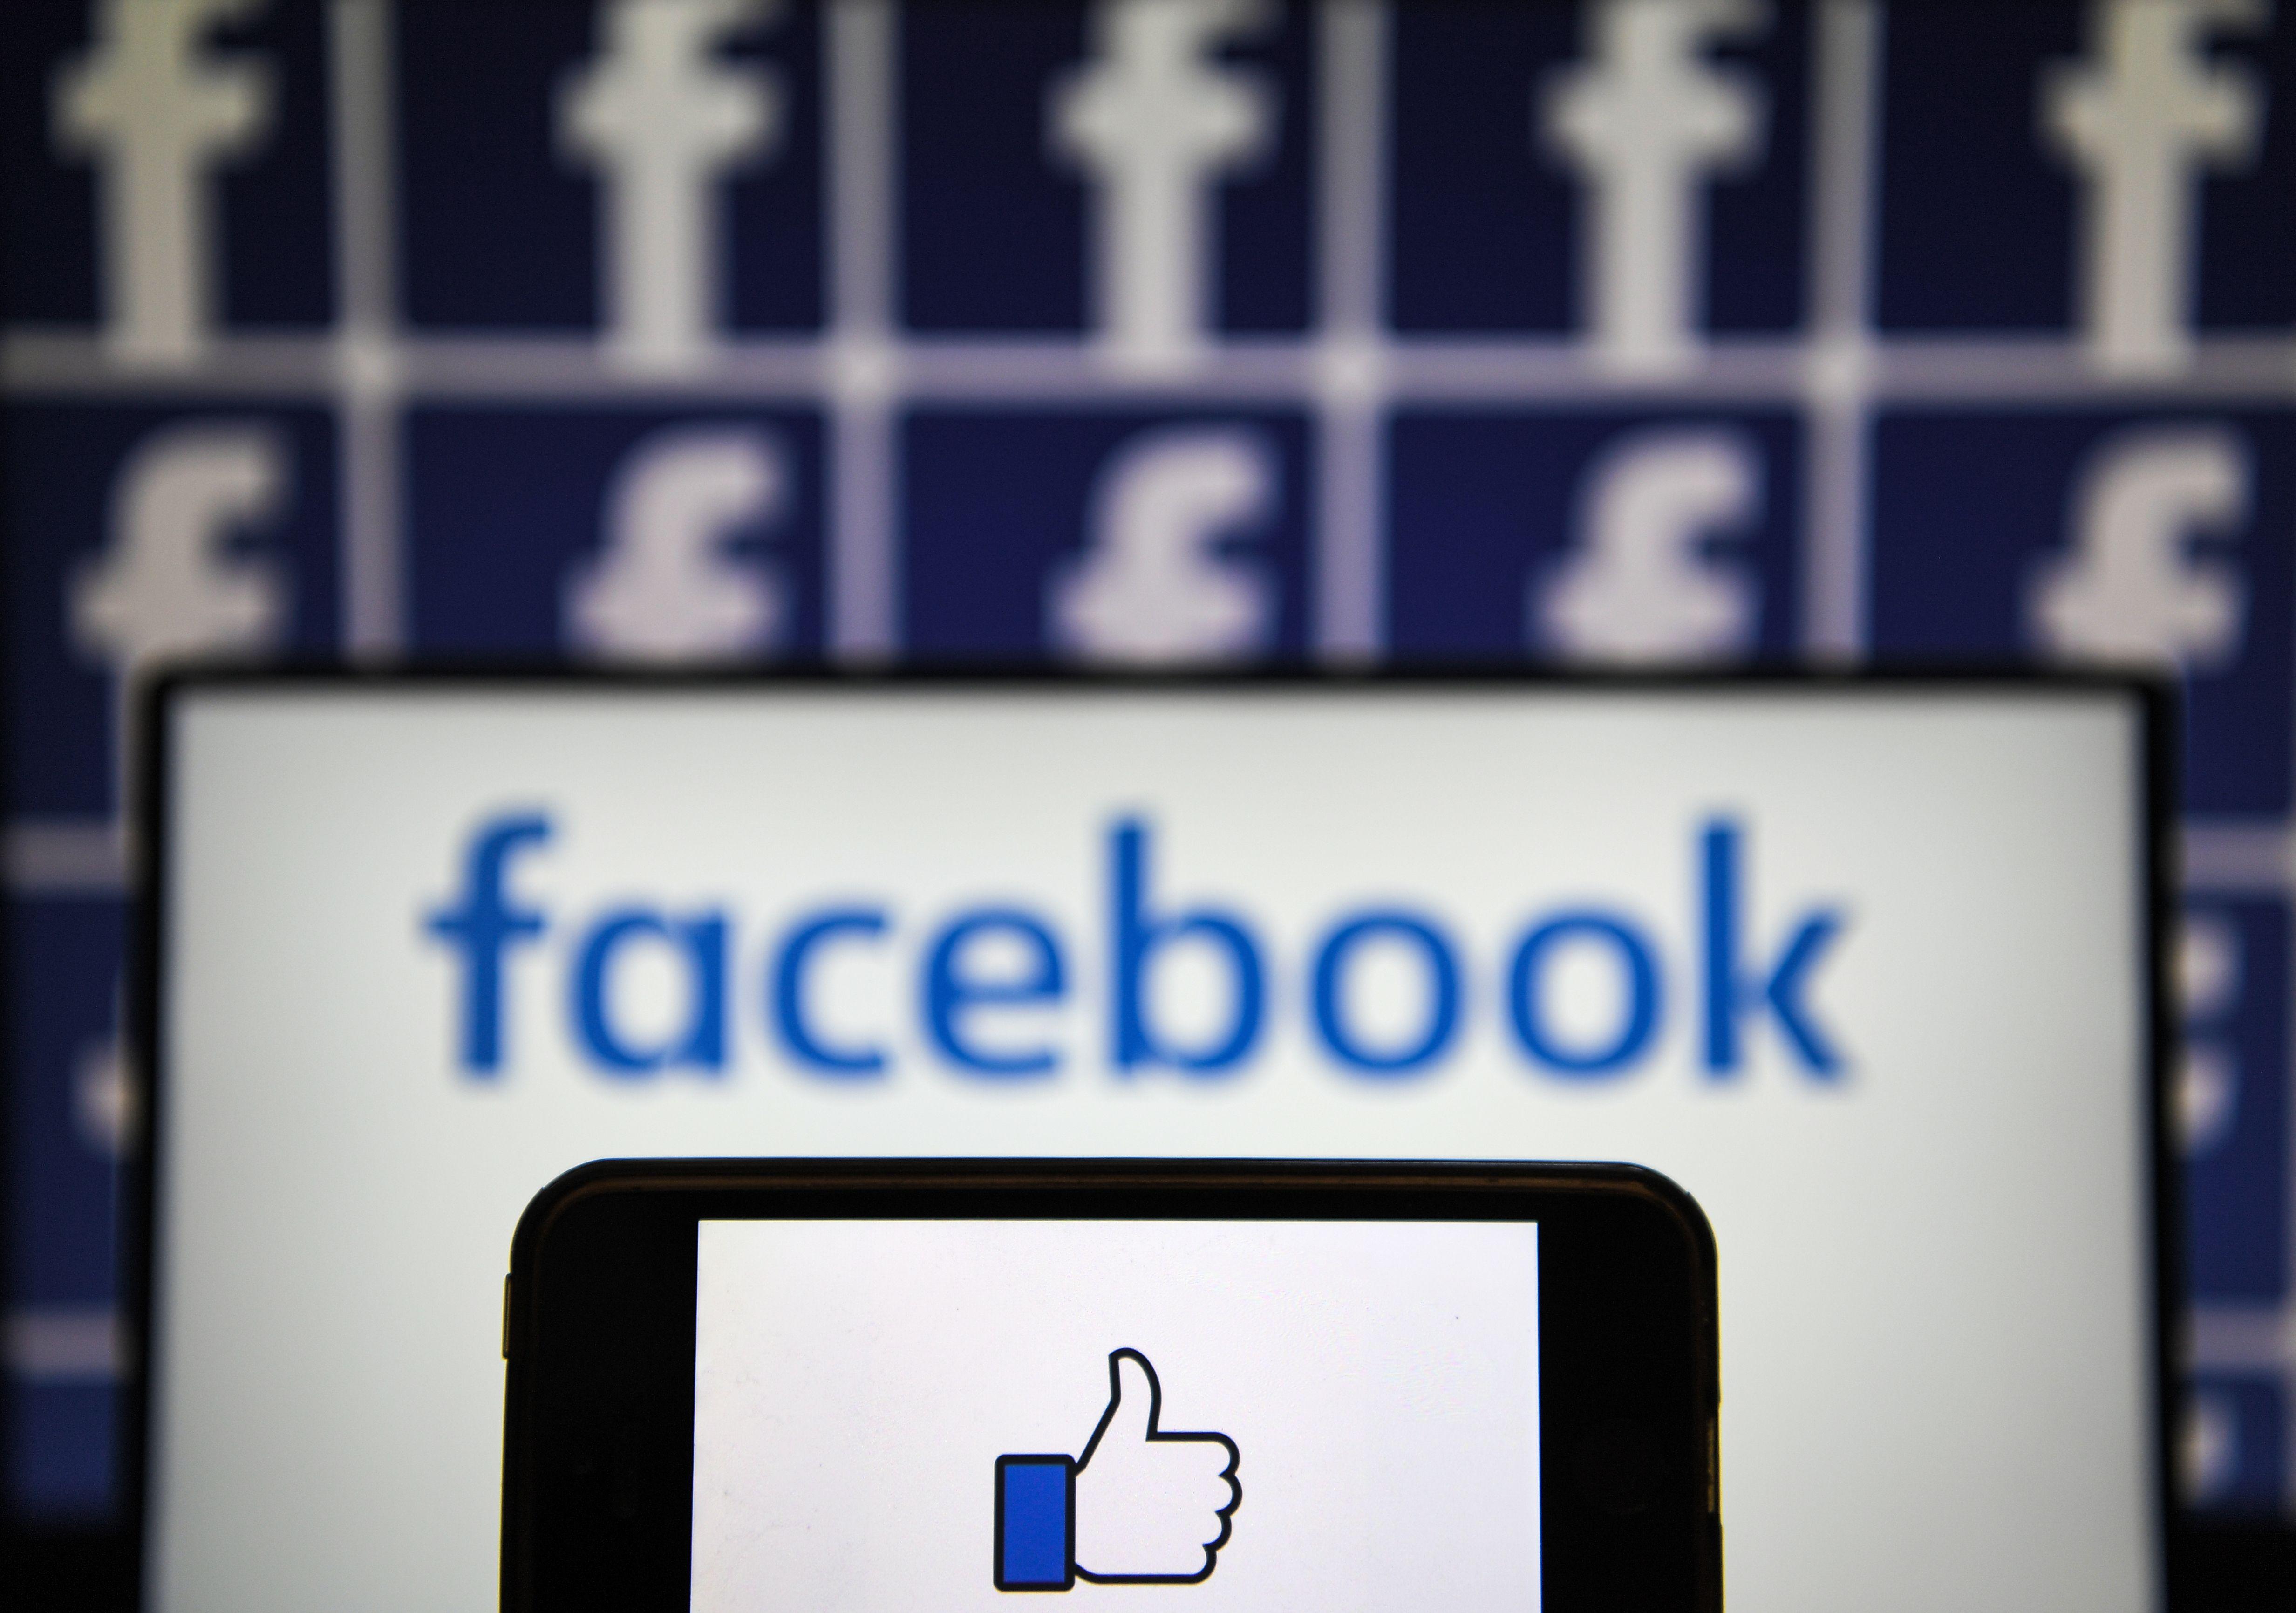 FRANCE-TECHNOLOGY-INTERNET-FACEBOOK-SOCIAL NETWORK-LOGO